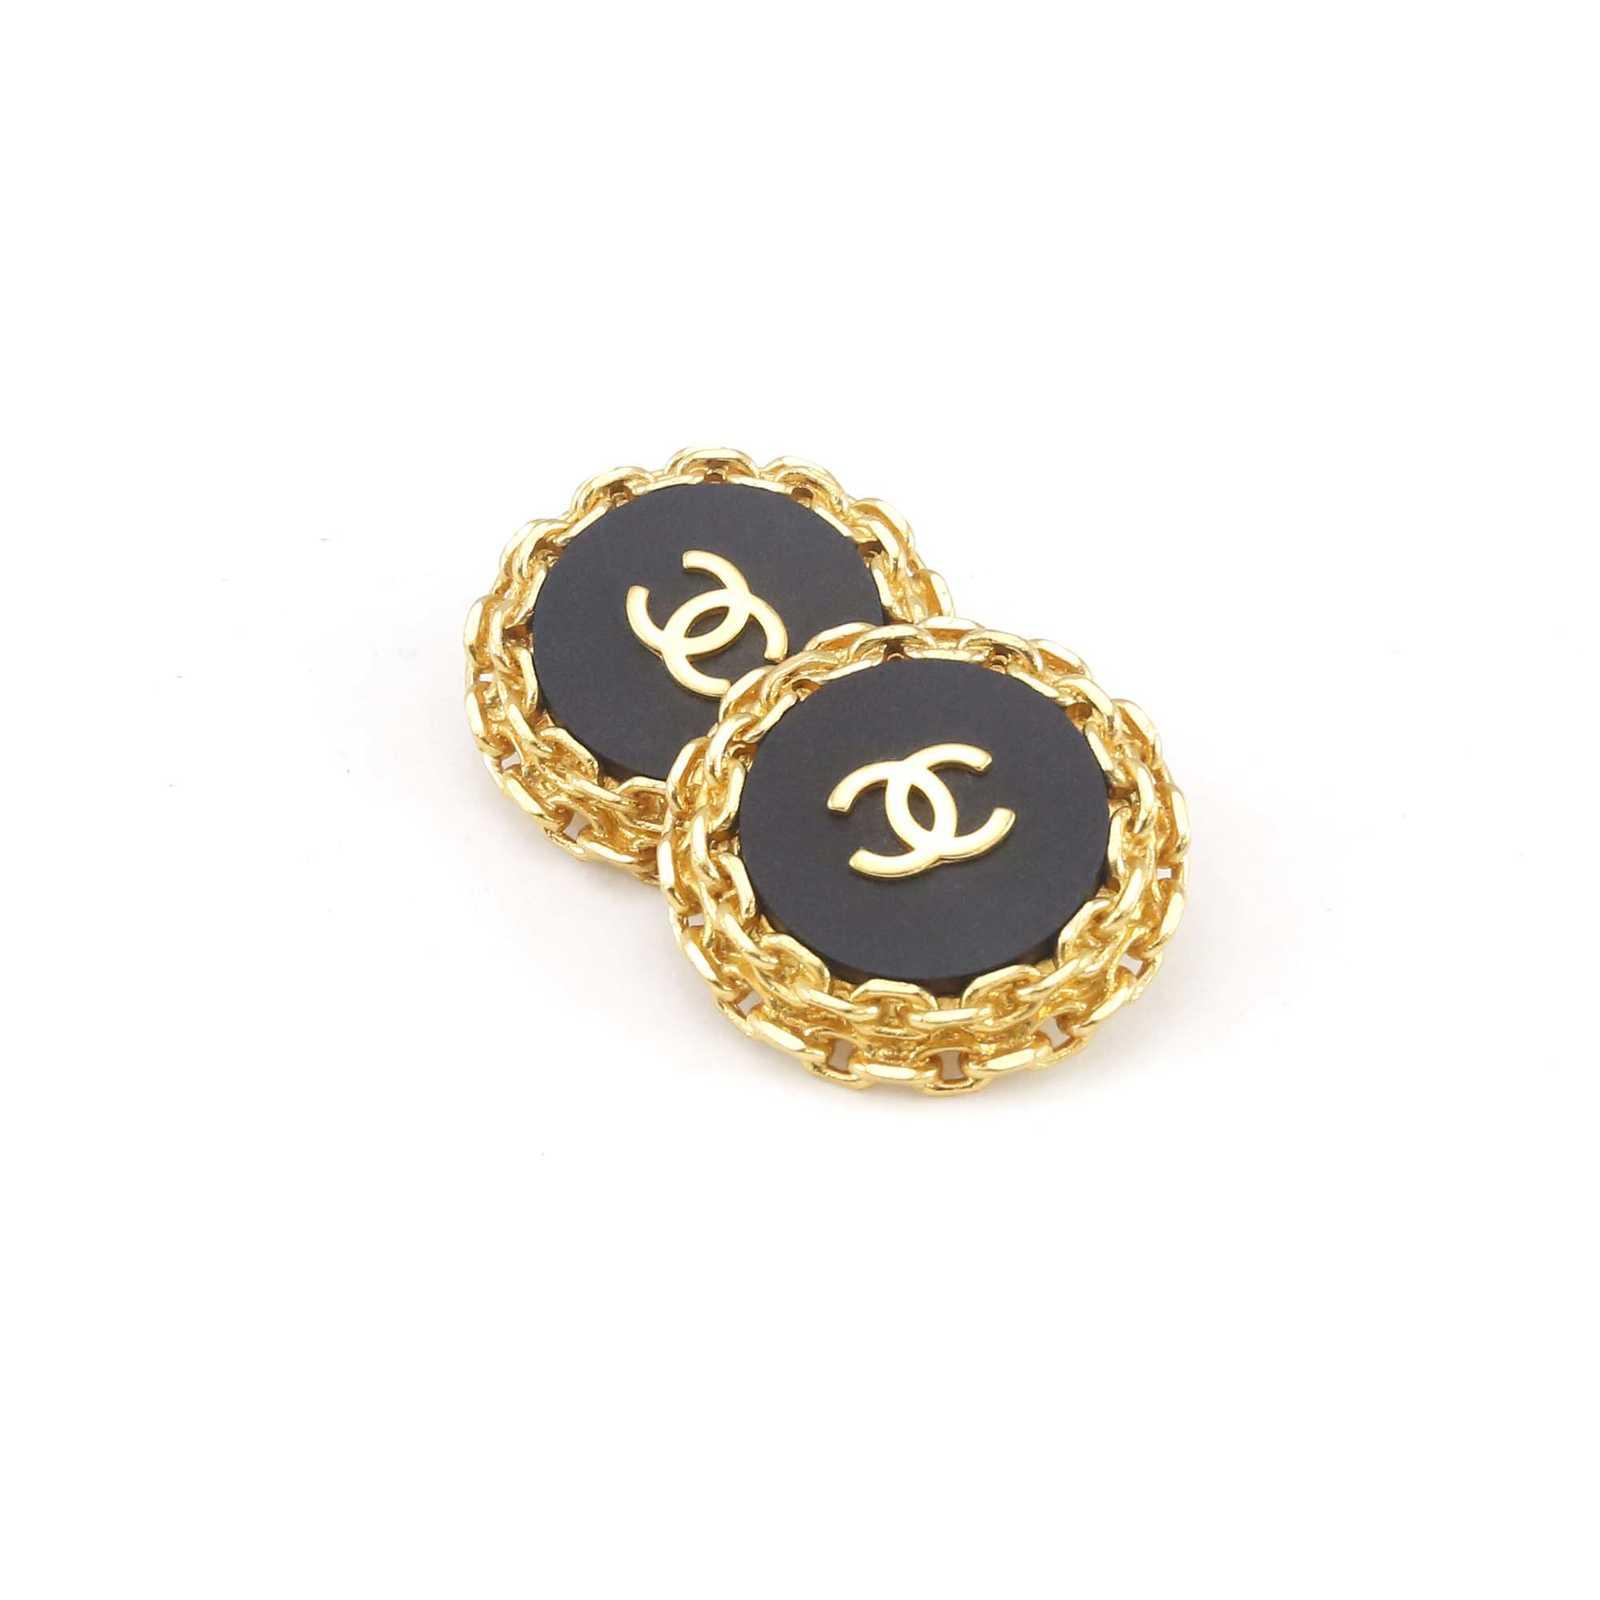 Chanel Vintage  Luxury Designer Clothing Brands  Farfetch